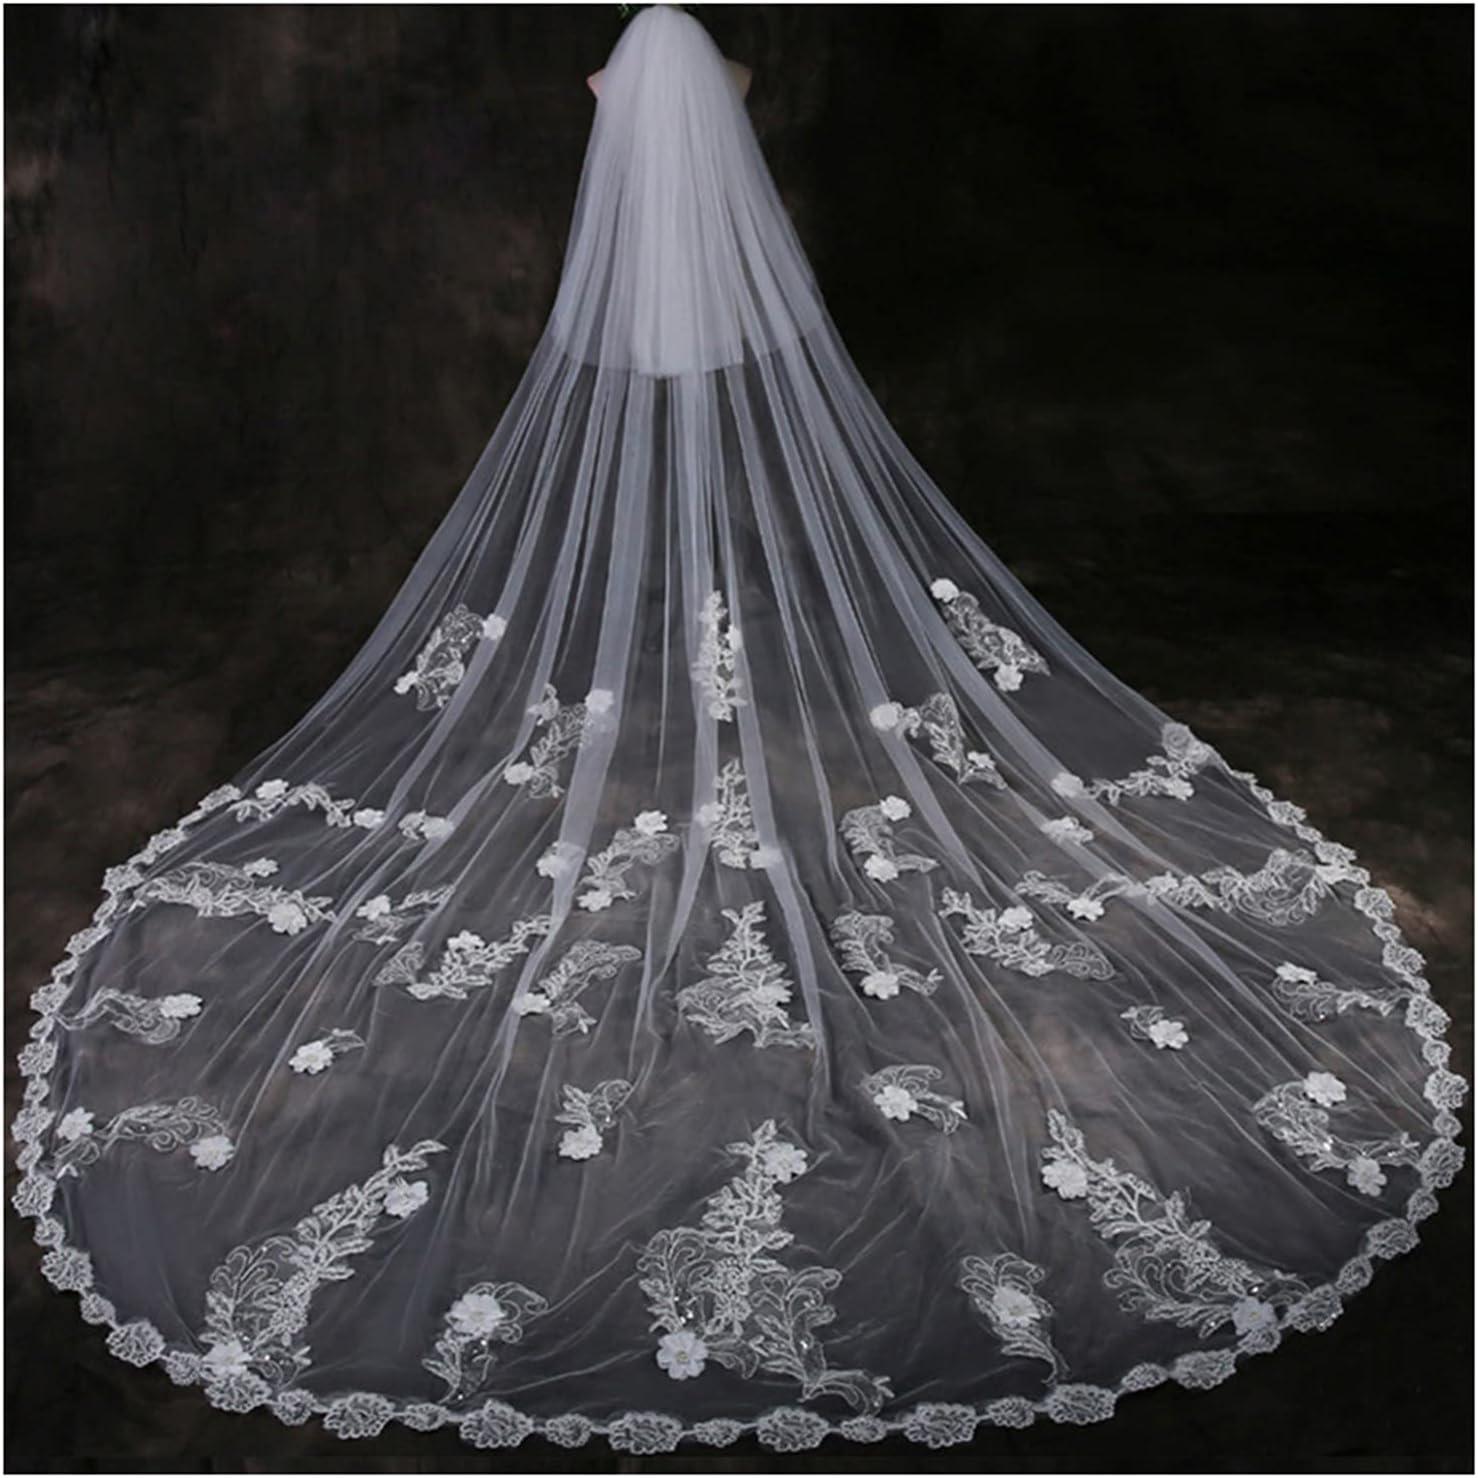 HEMOTONE Bridal Veil Applique Wedding Lace 5 ☆ popular Industry No. 1 Long Weddin Side